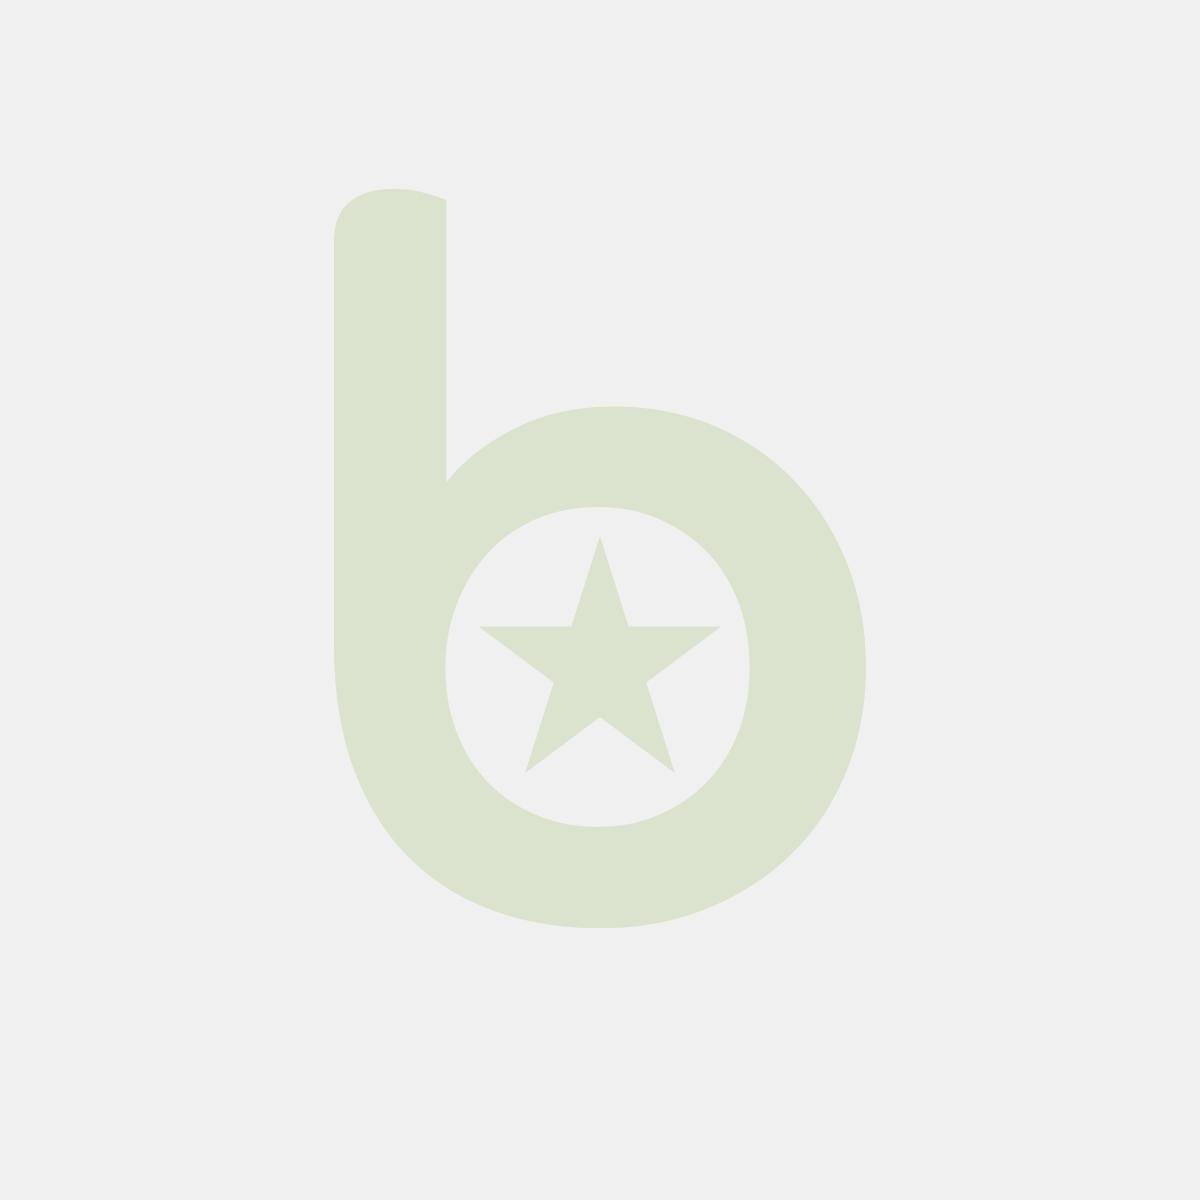 GREENBAG ZIELONY 320x280x220mm